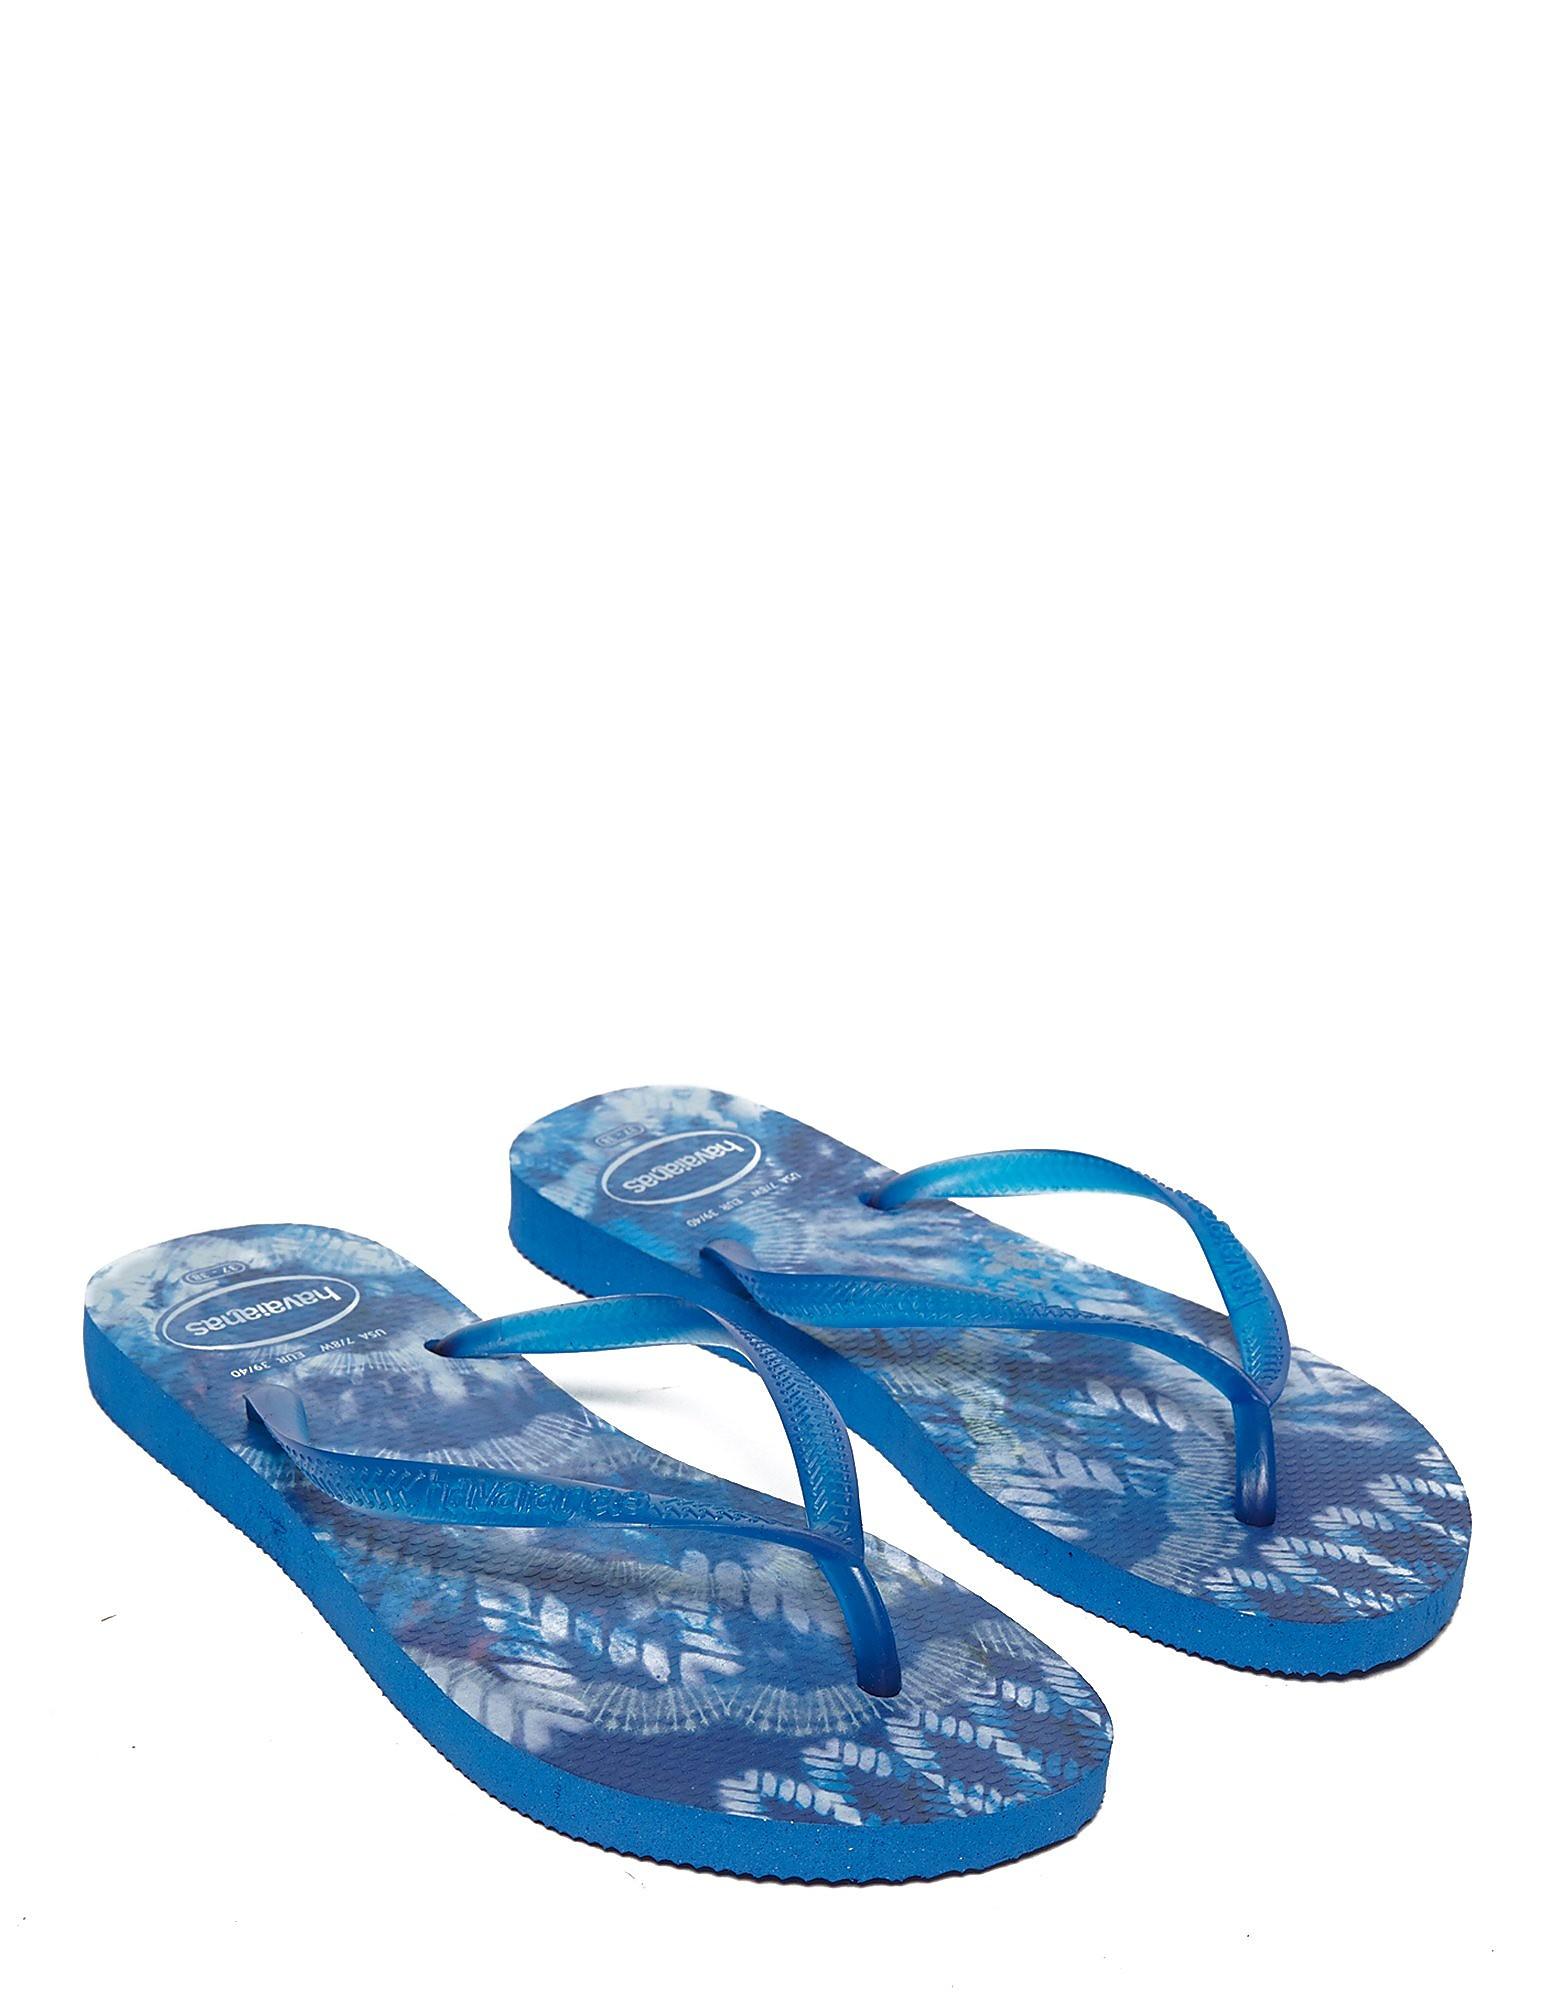 Havaianas Slie Tie Dye Flip Flops Women's